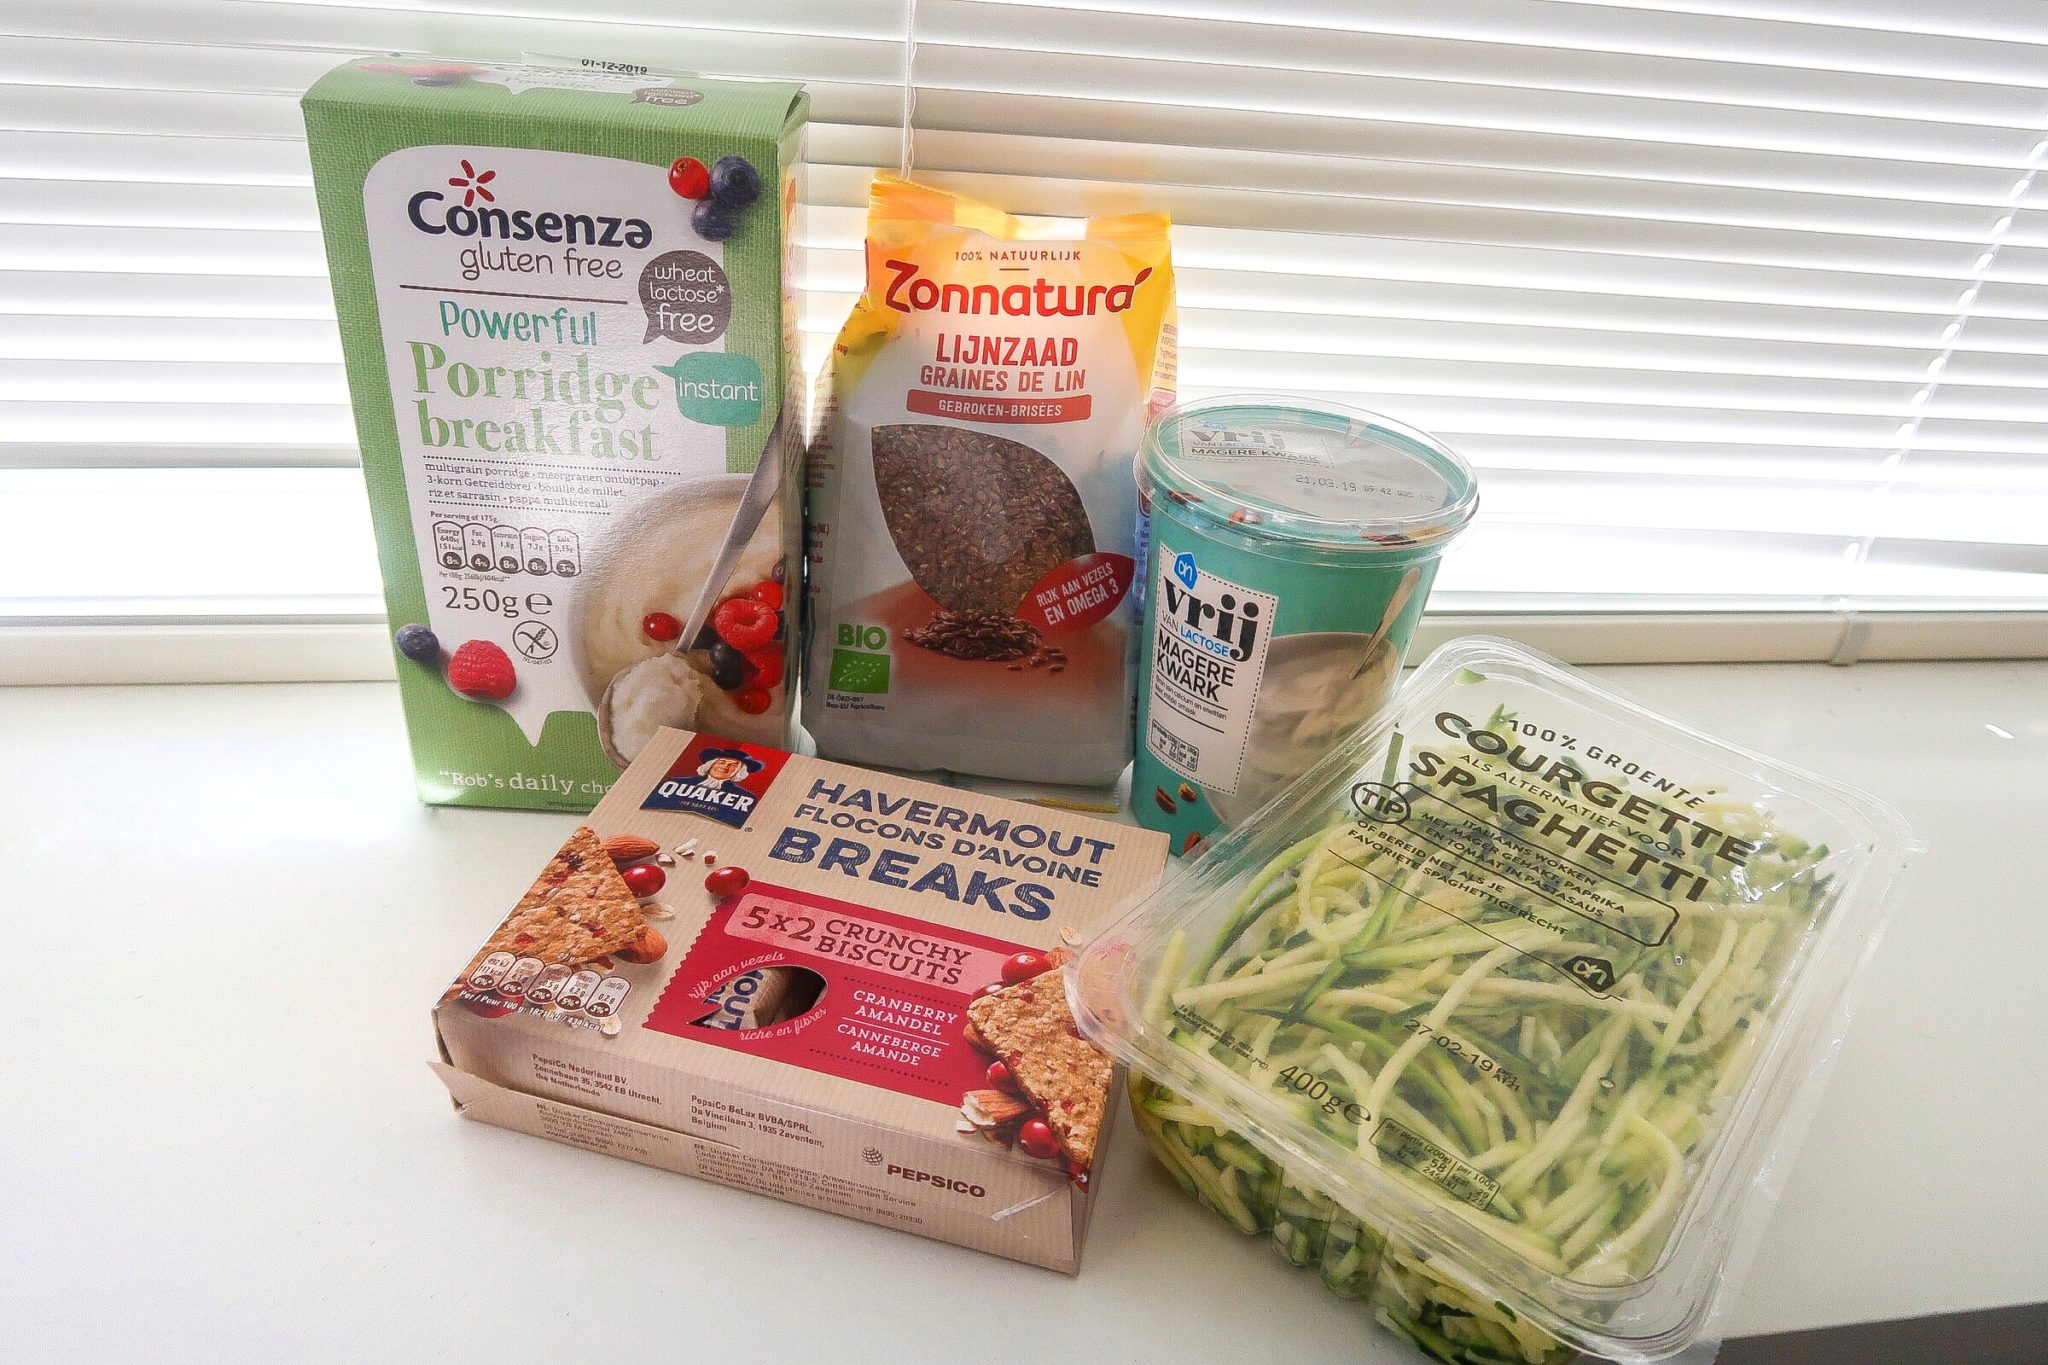 gezonde producten, product tips, gezond